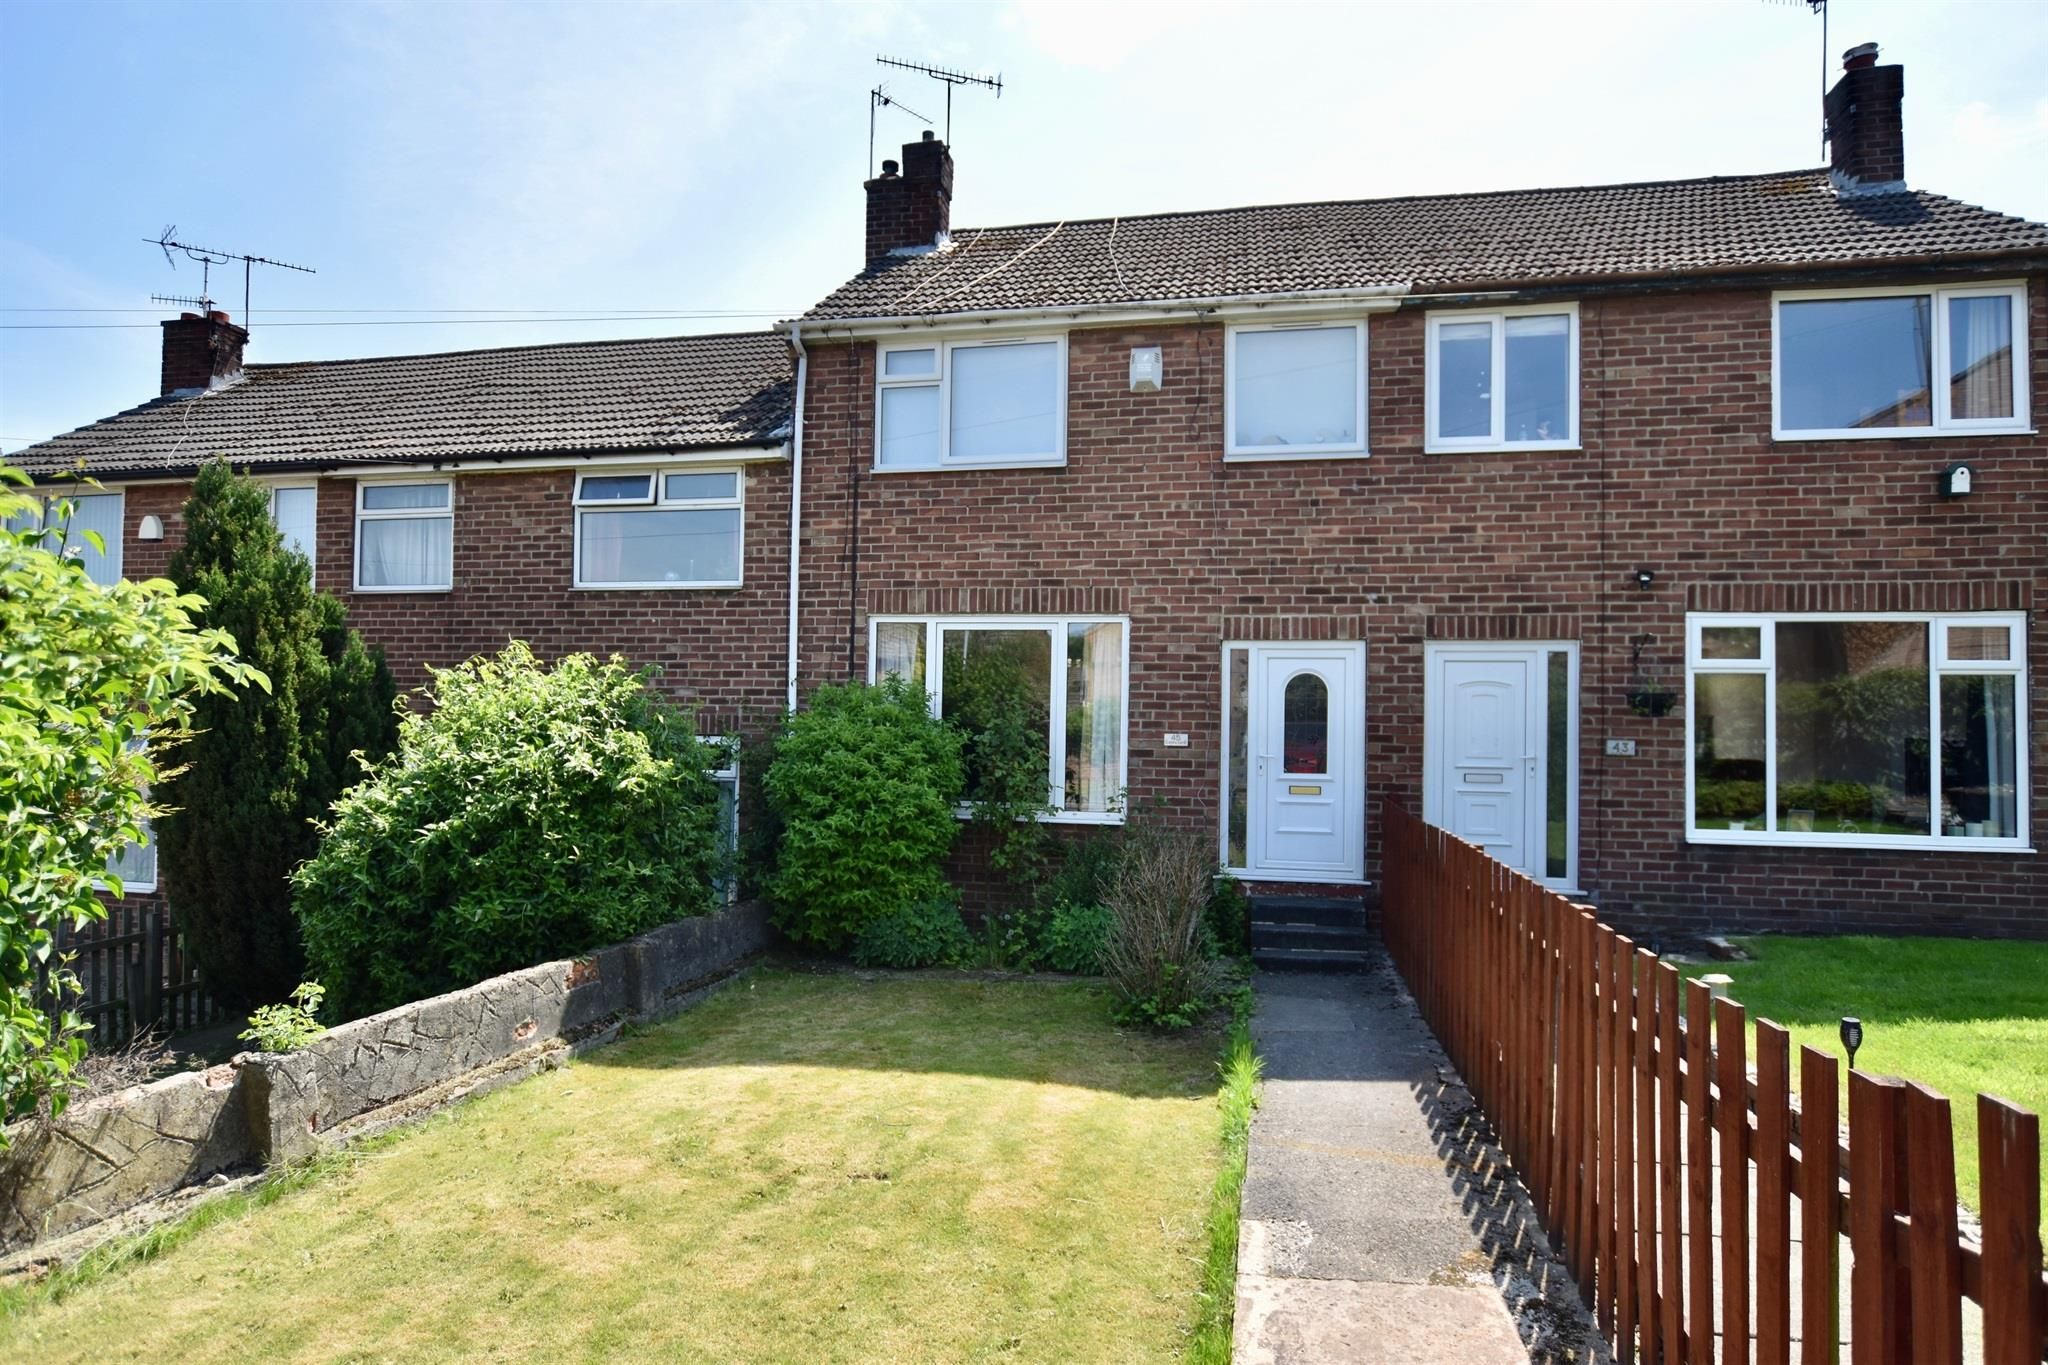 Property photo 1 of 12. Exterior